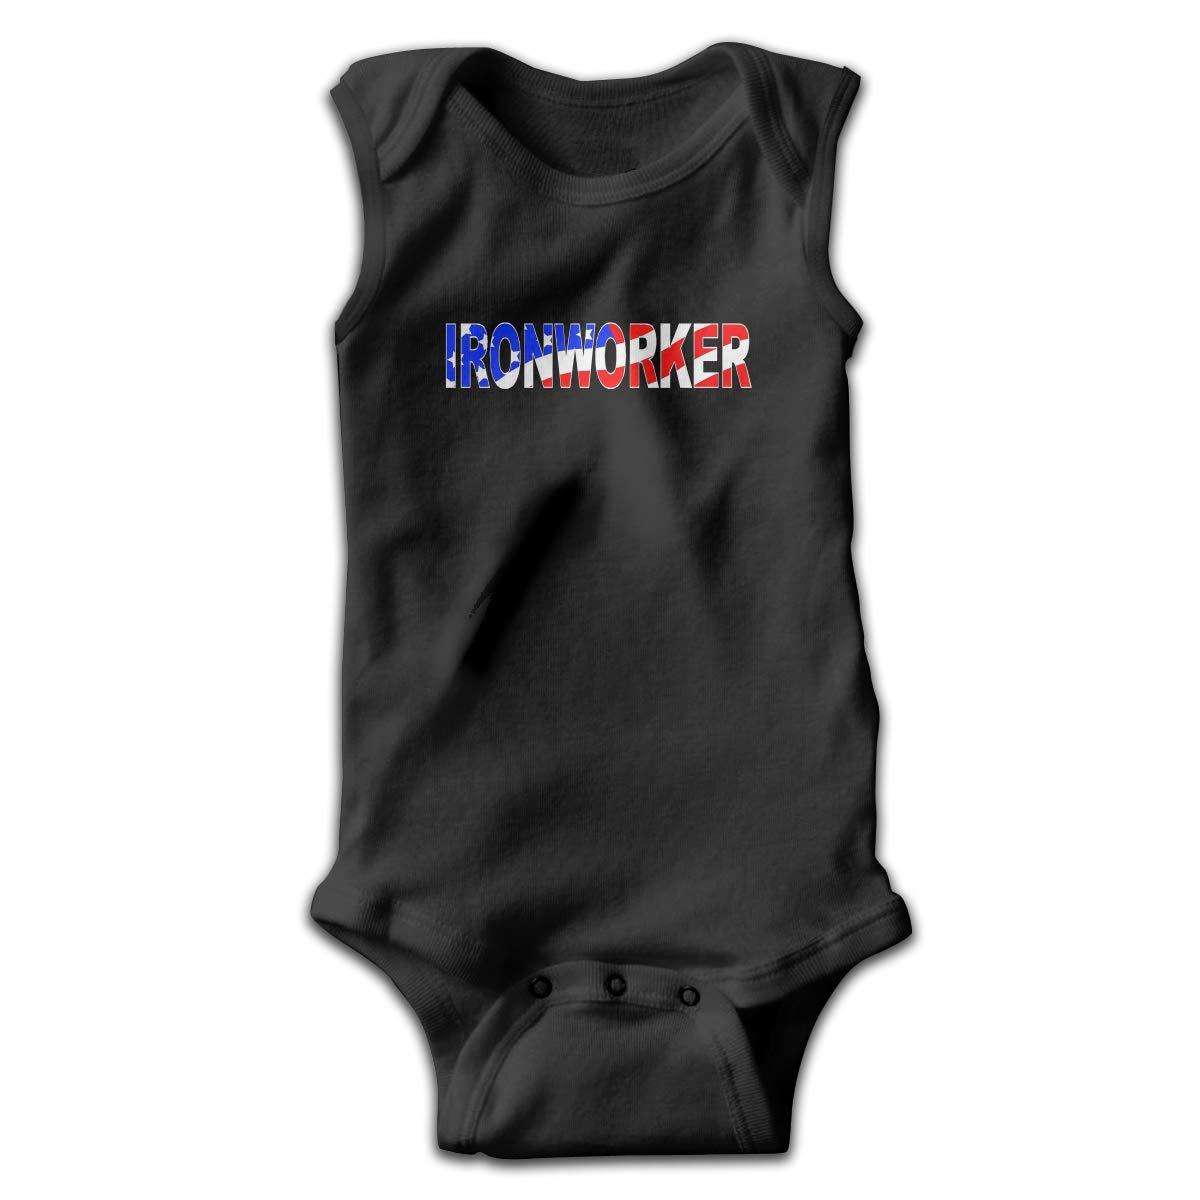 Mrshelp Ironworker USA Flag Sleeveless Infant Jumpsuit Cute Toddler Summer Bodysuits